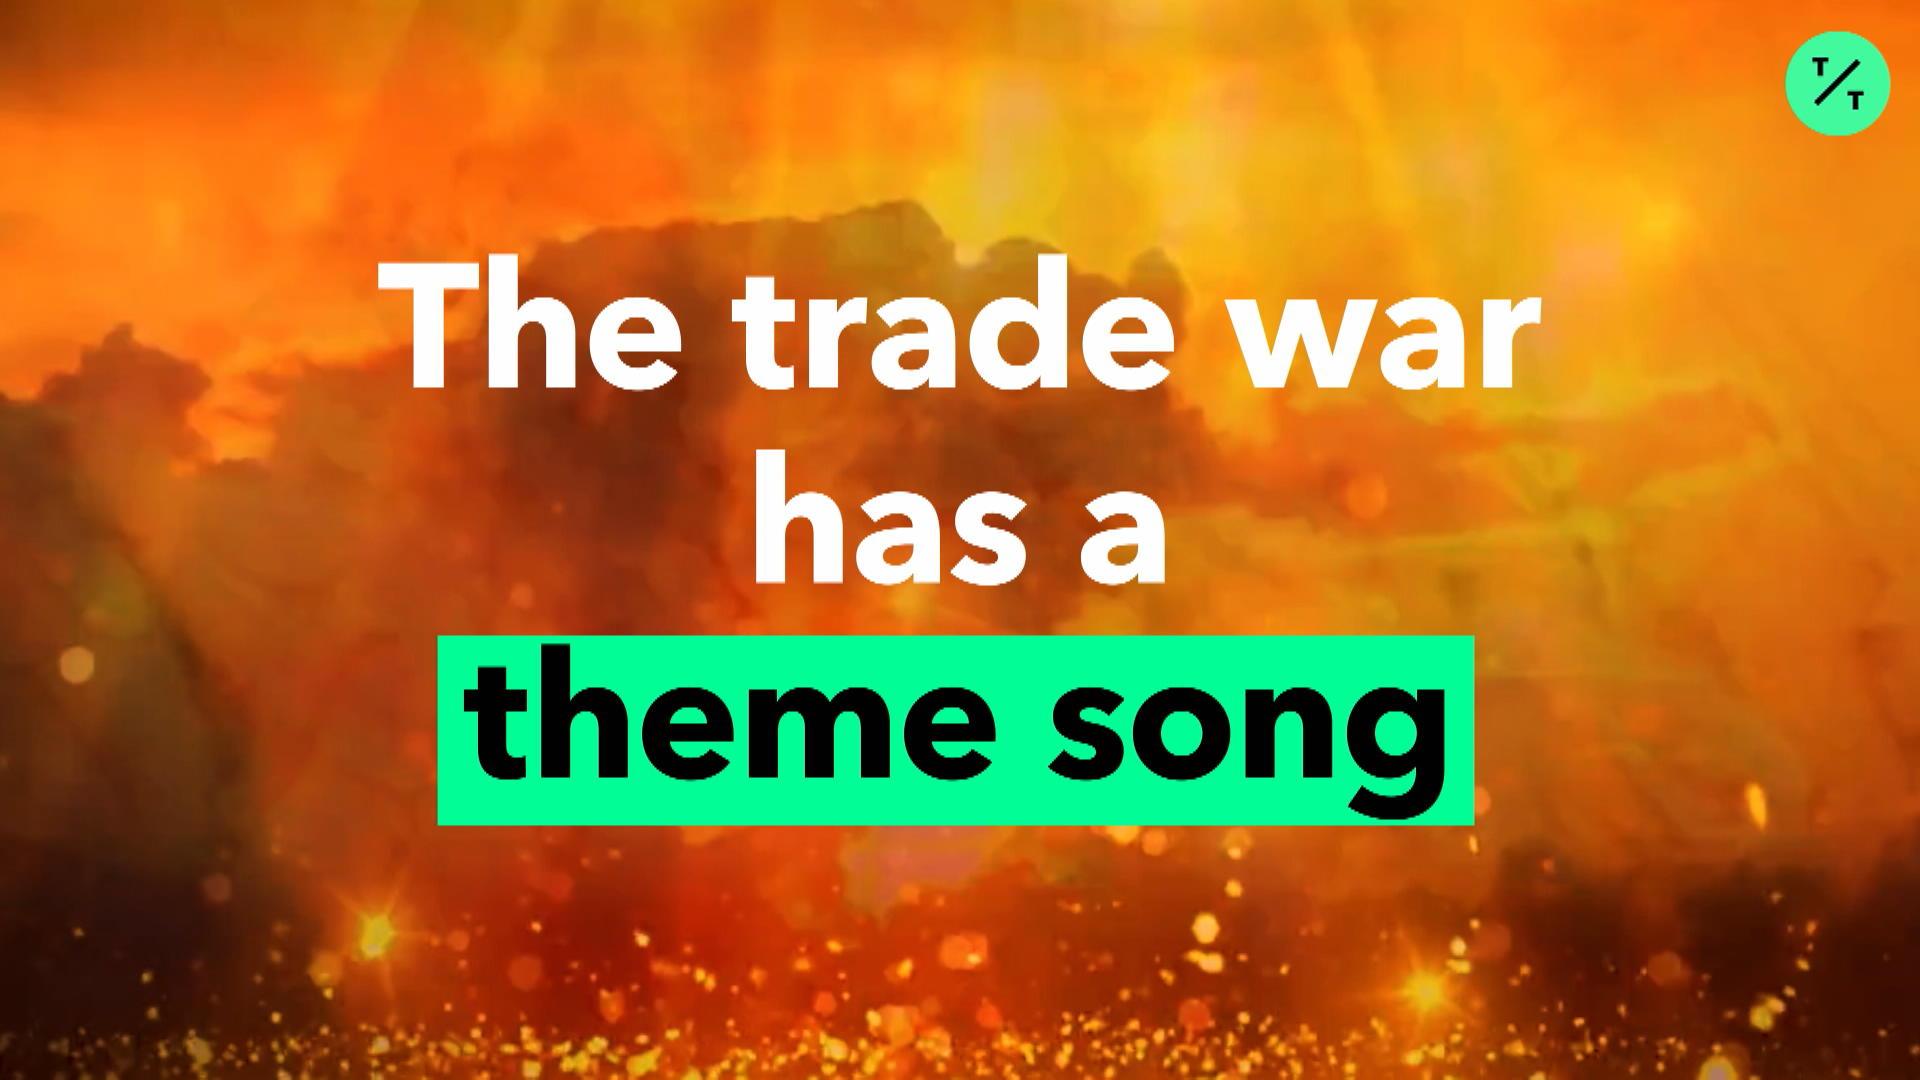 China-US Trade War Song Goes Viral on Weibo - Bloomberg